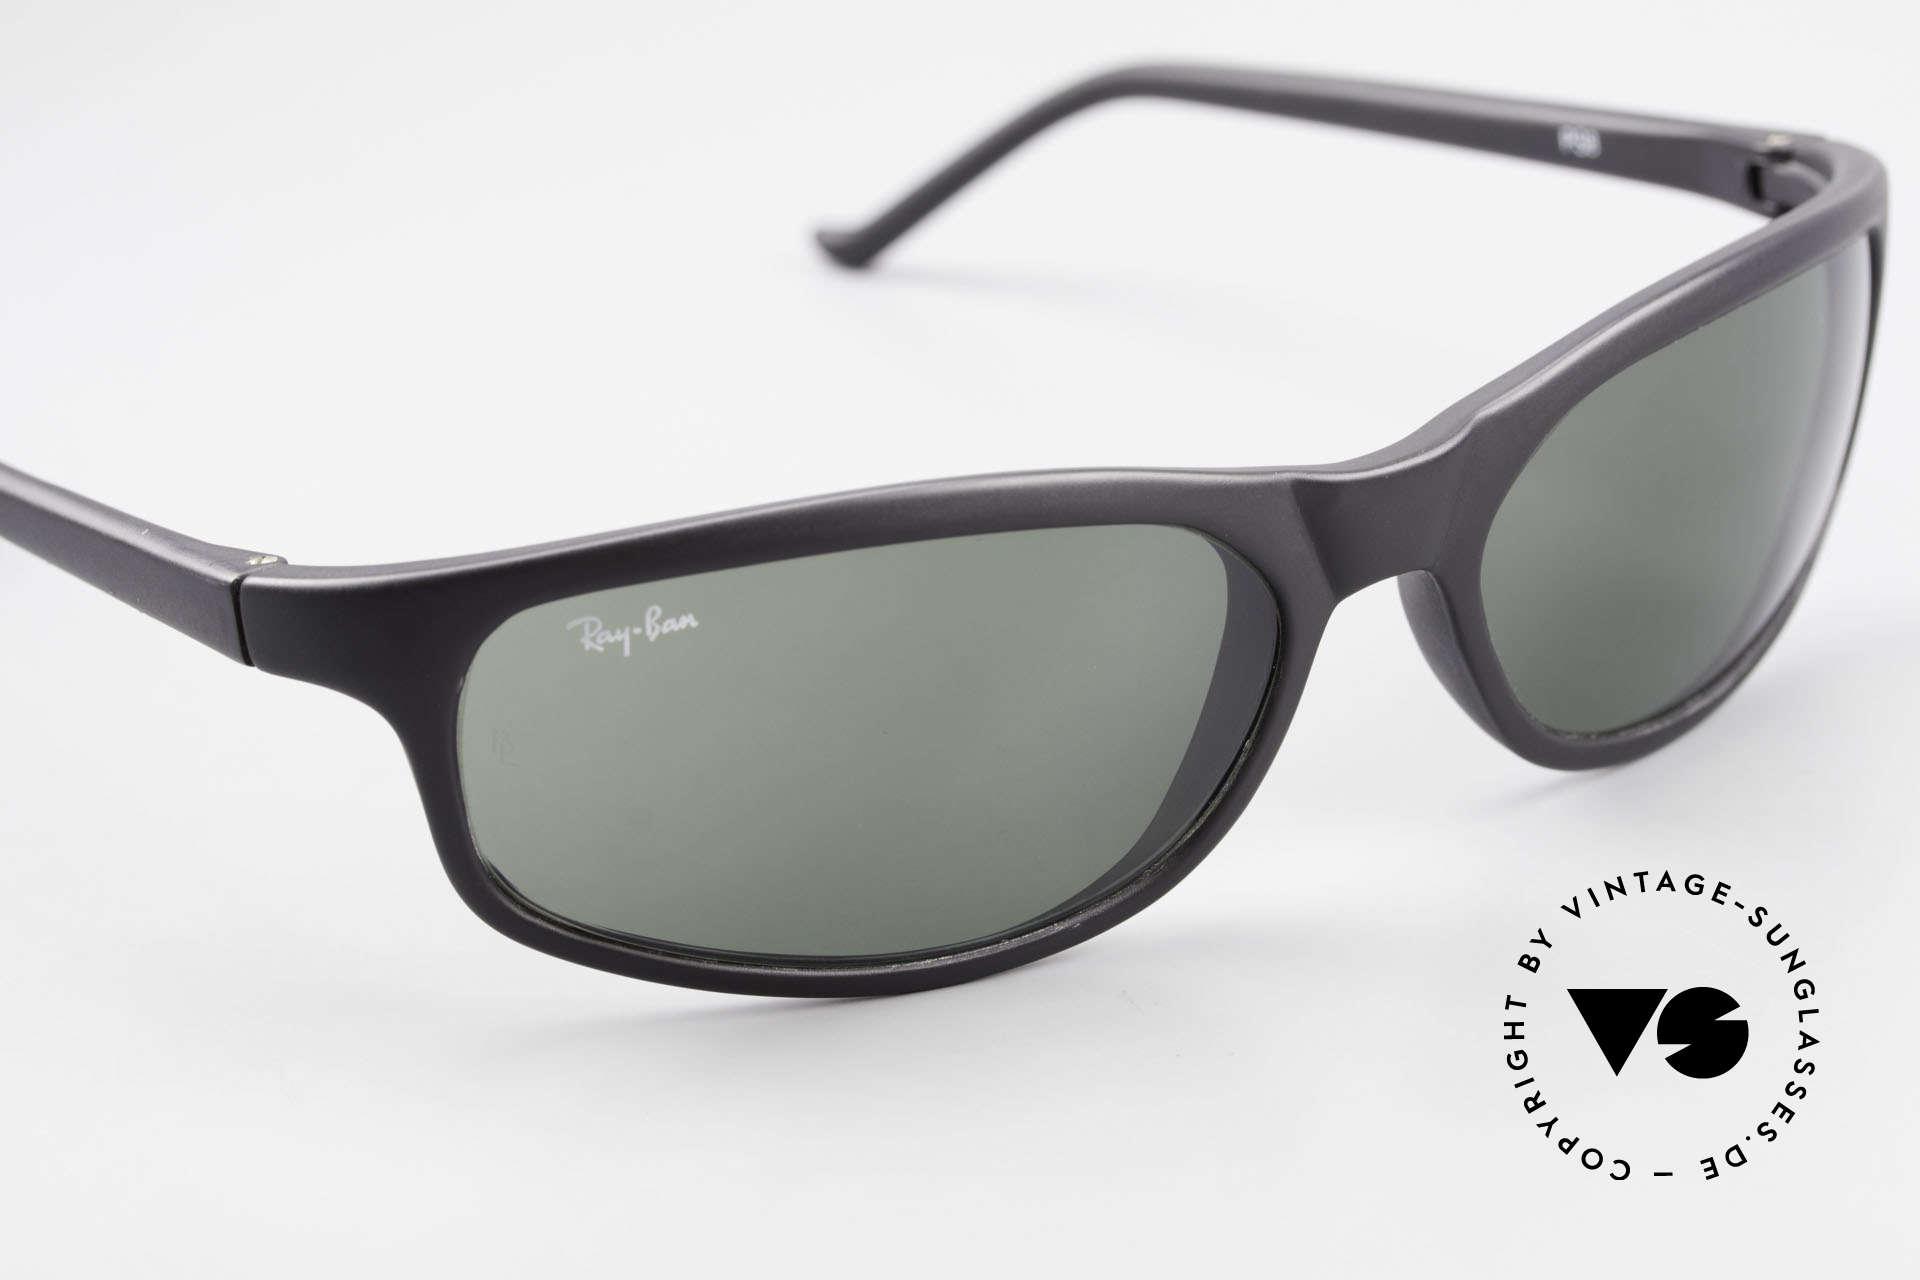 Ray Ban Predator 8 Sporty B&L USA Sunglasses, unworn (like all our vintage Ray Ban sunglasses), Made for Men